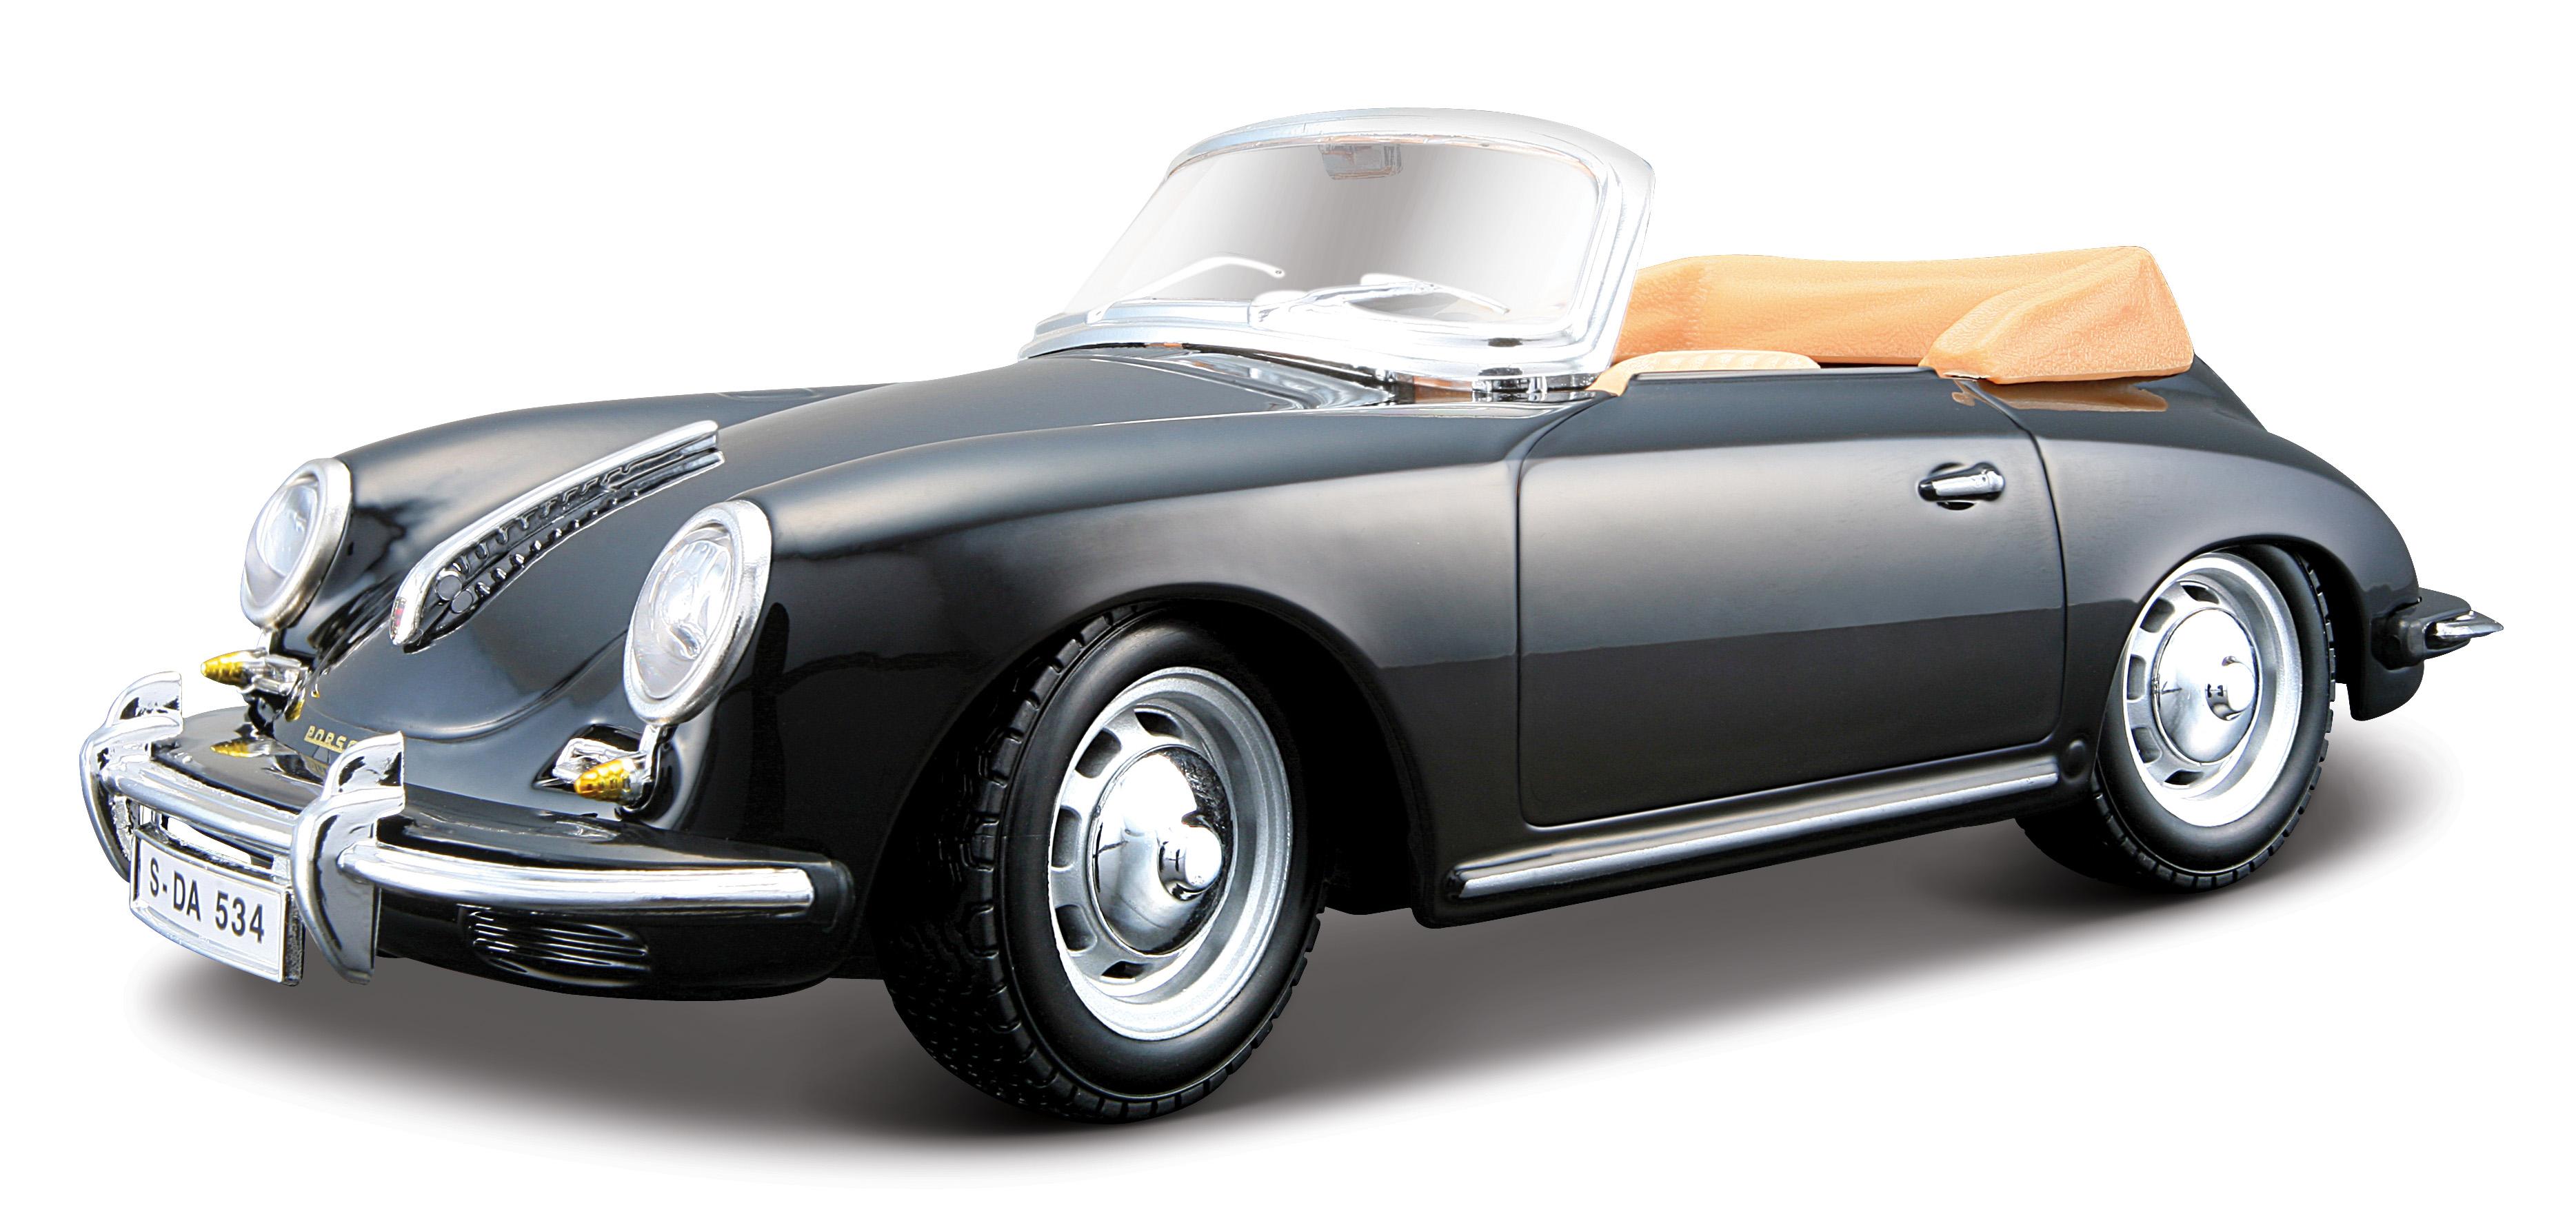 porsche 356 b coupe 1961 модель